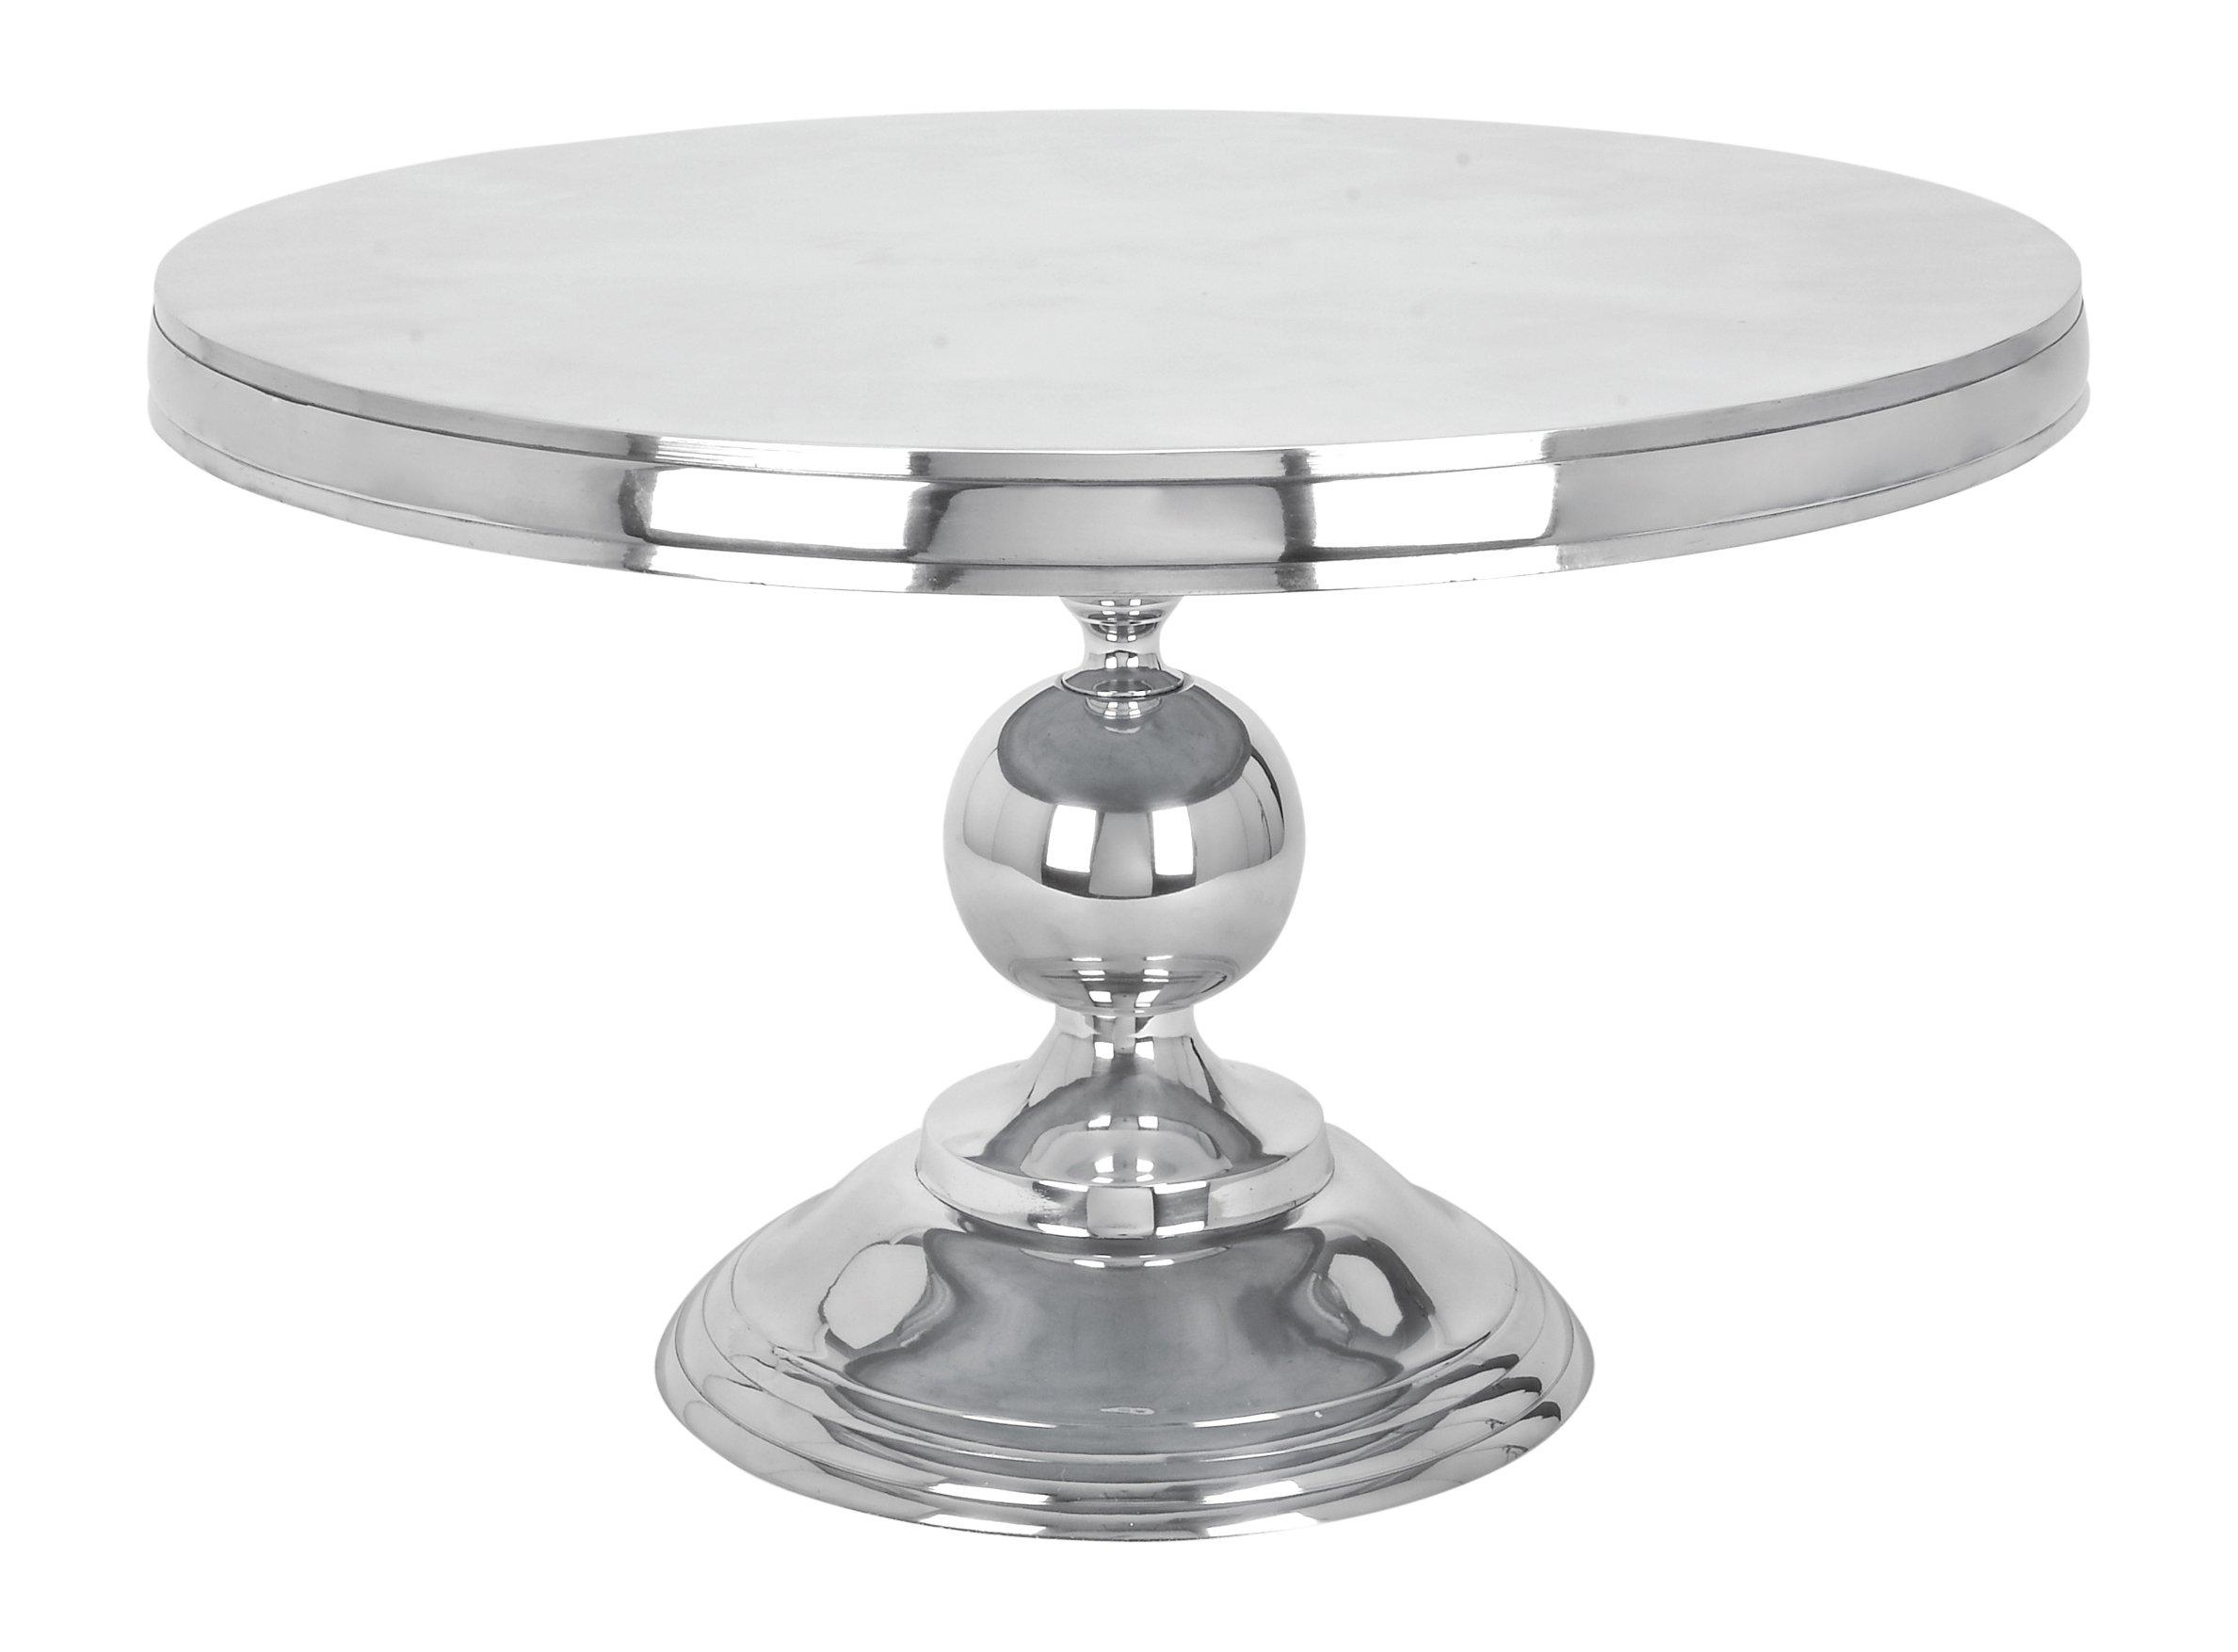 Deco 79 30780 Aluminum Coffee Table, 30'' x 19''